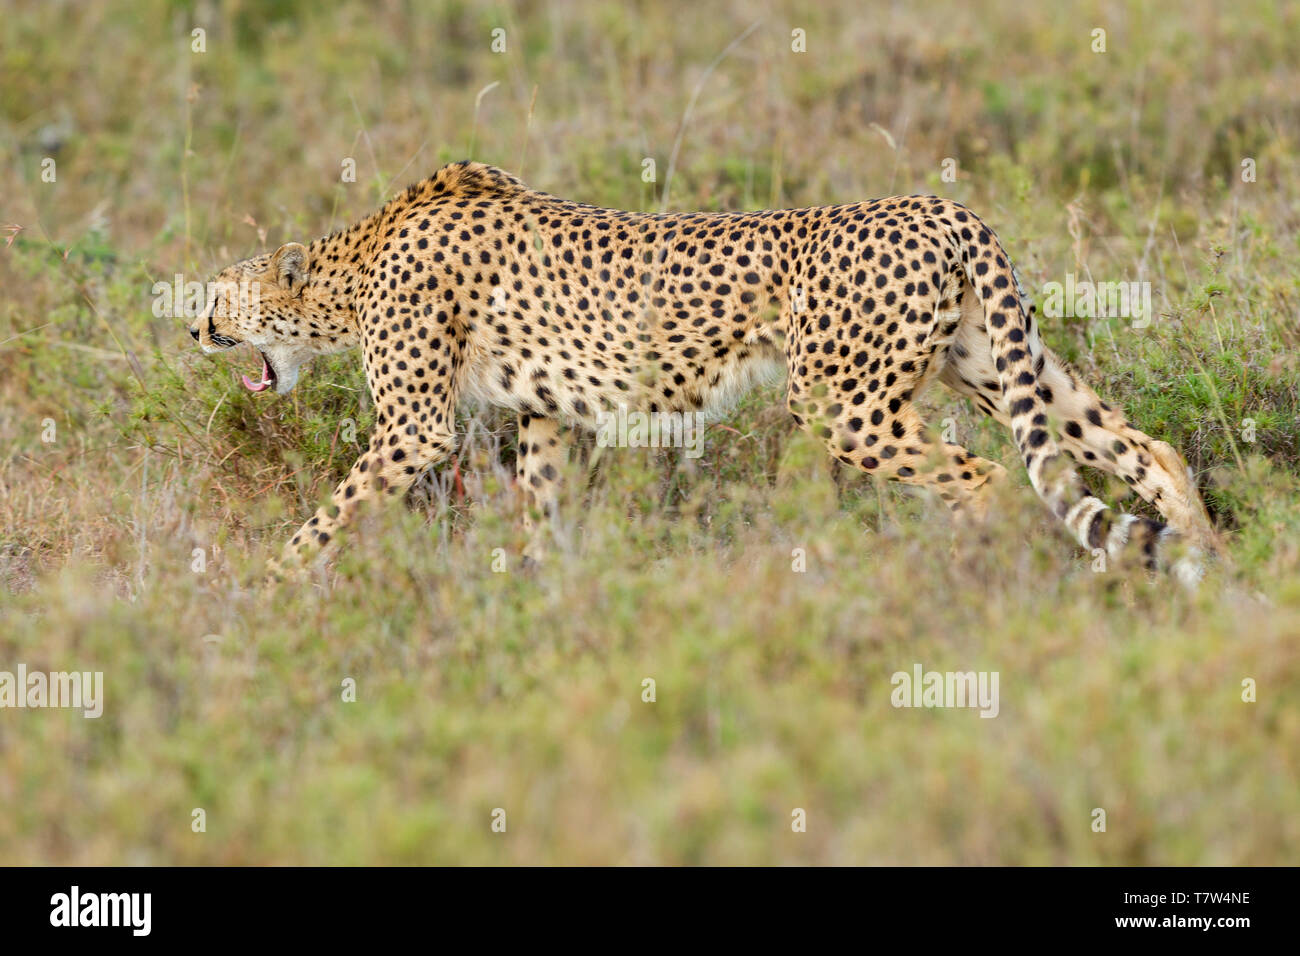 A female cheetah walking in open scrub and snarling, landscape format, Ol Pejeta Conservancy, Laikipia, Kenya, Africa - Stock Image